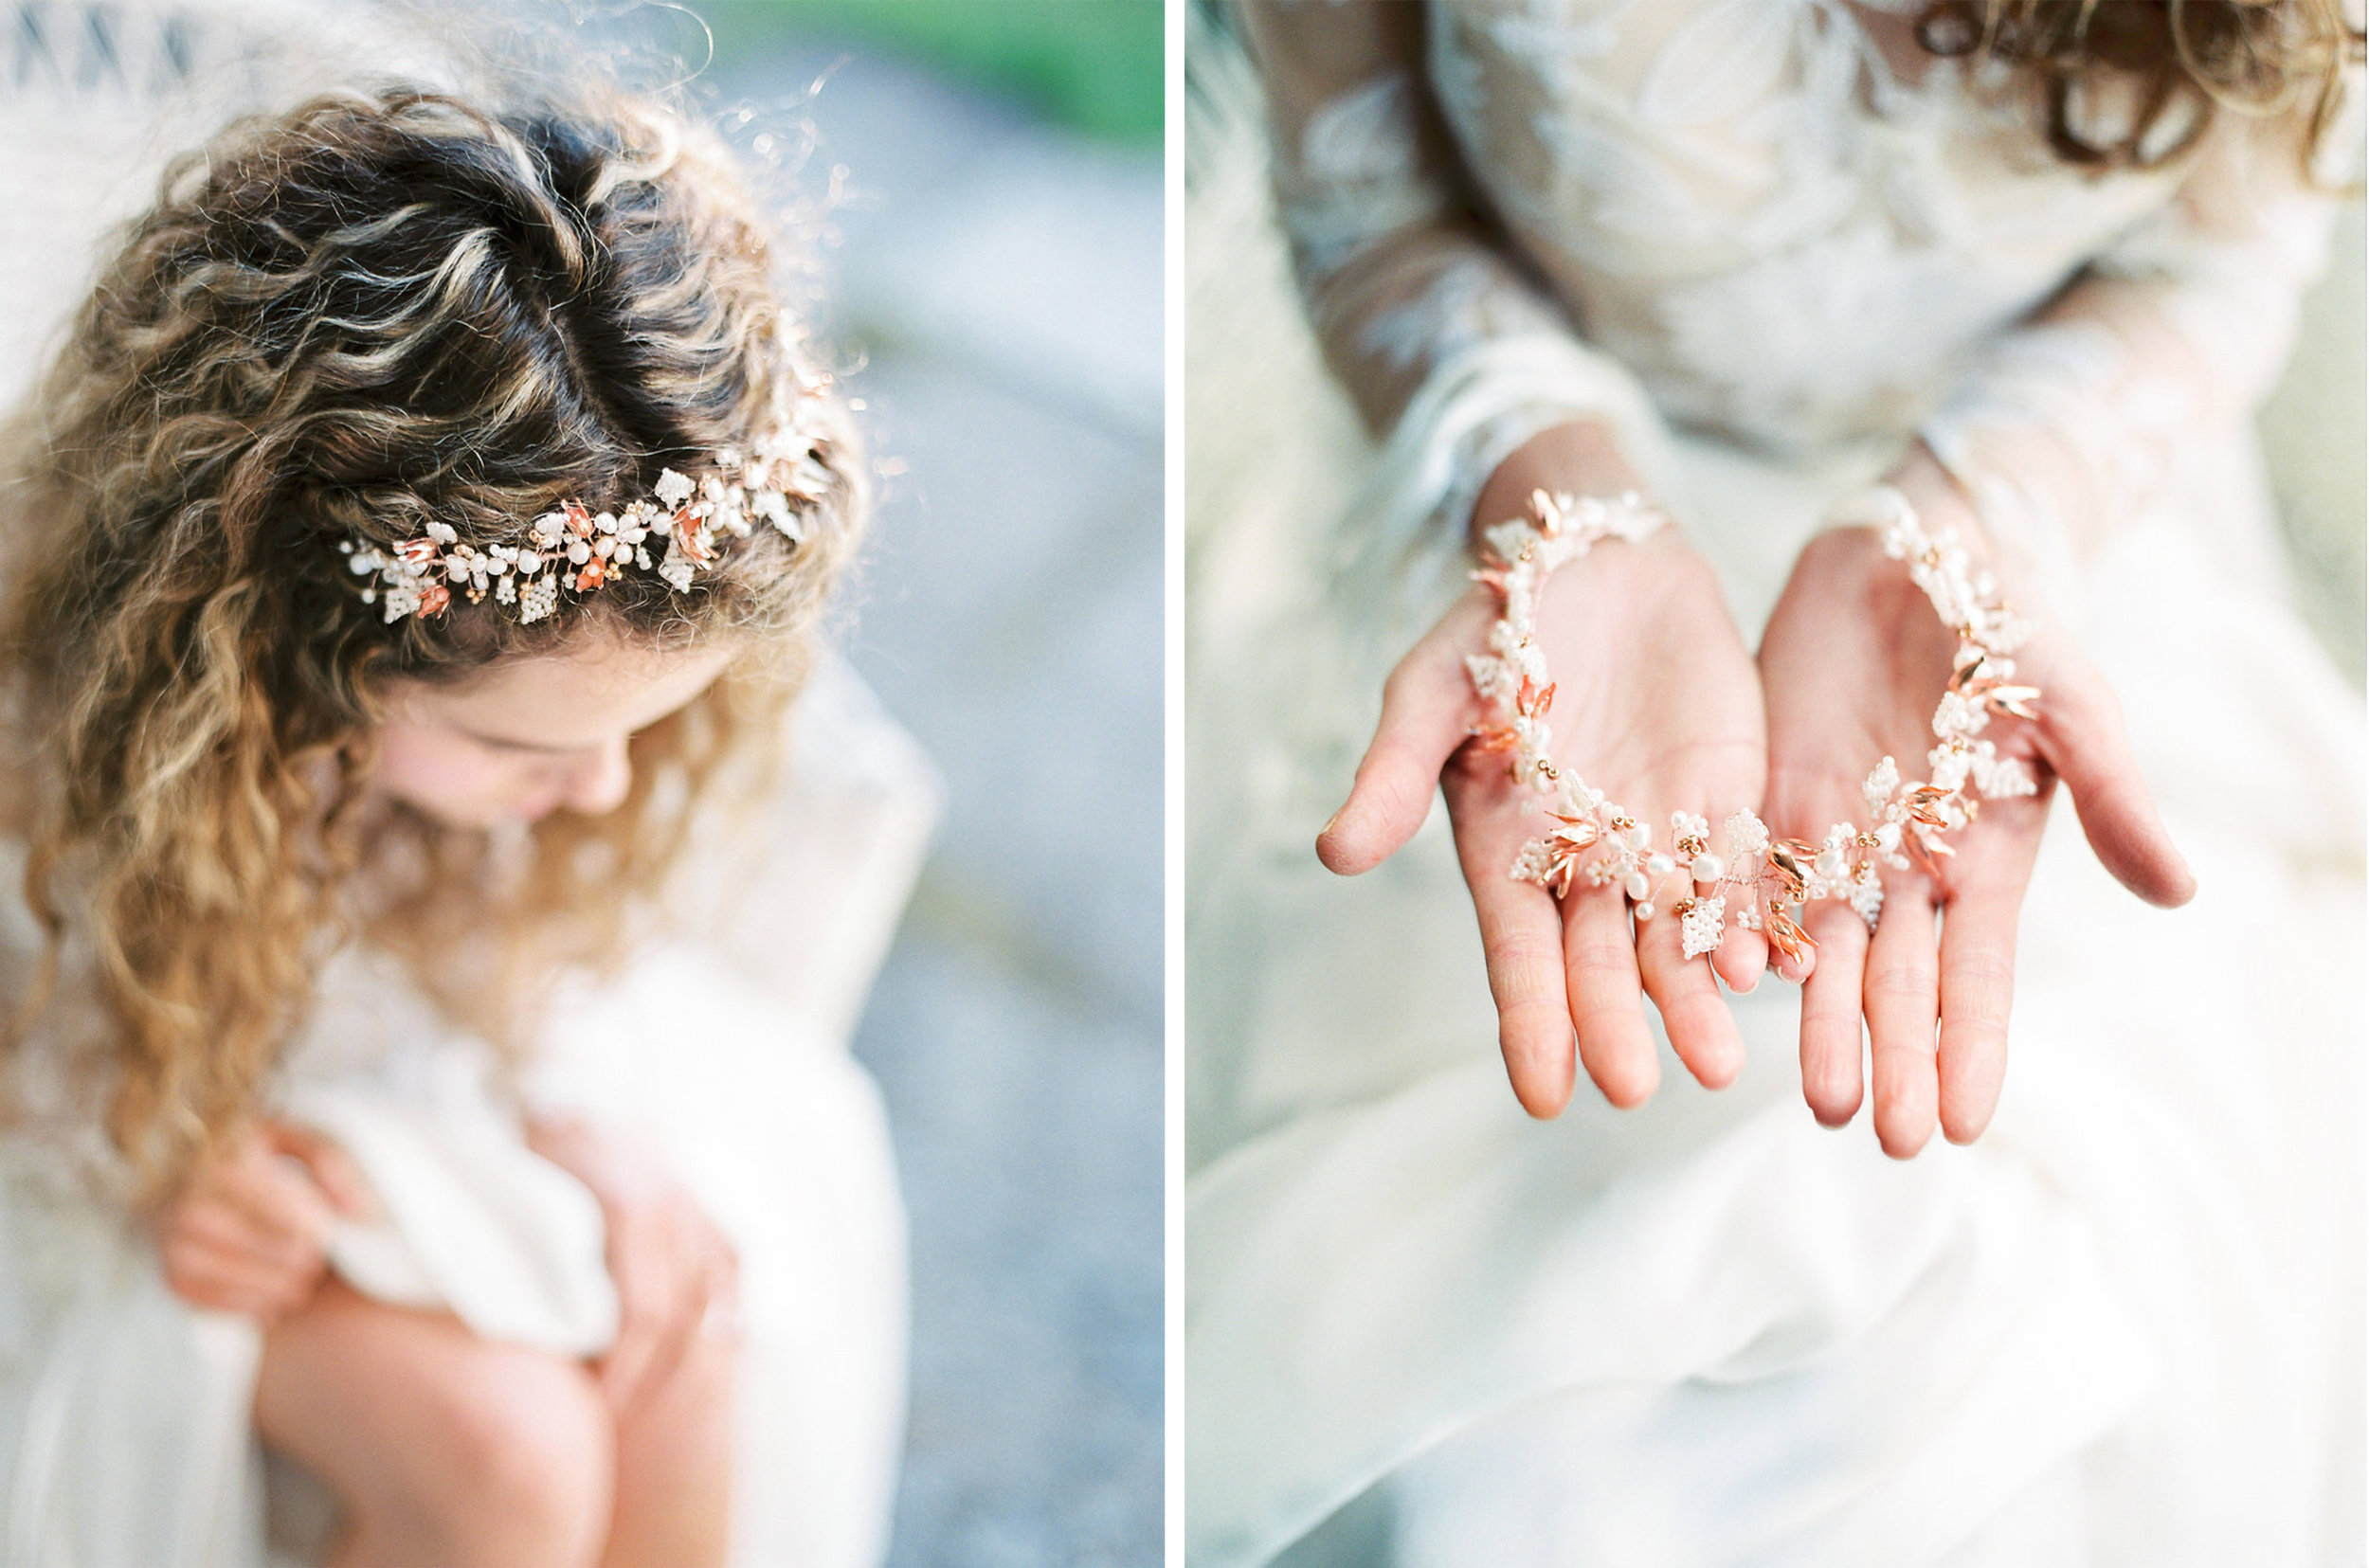 WeddingSparrow-PhotographybyIntoTheLight-Macias-lordan.com-ONLINESHARING(01eof50).jpg